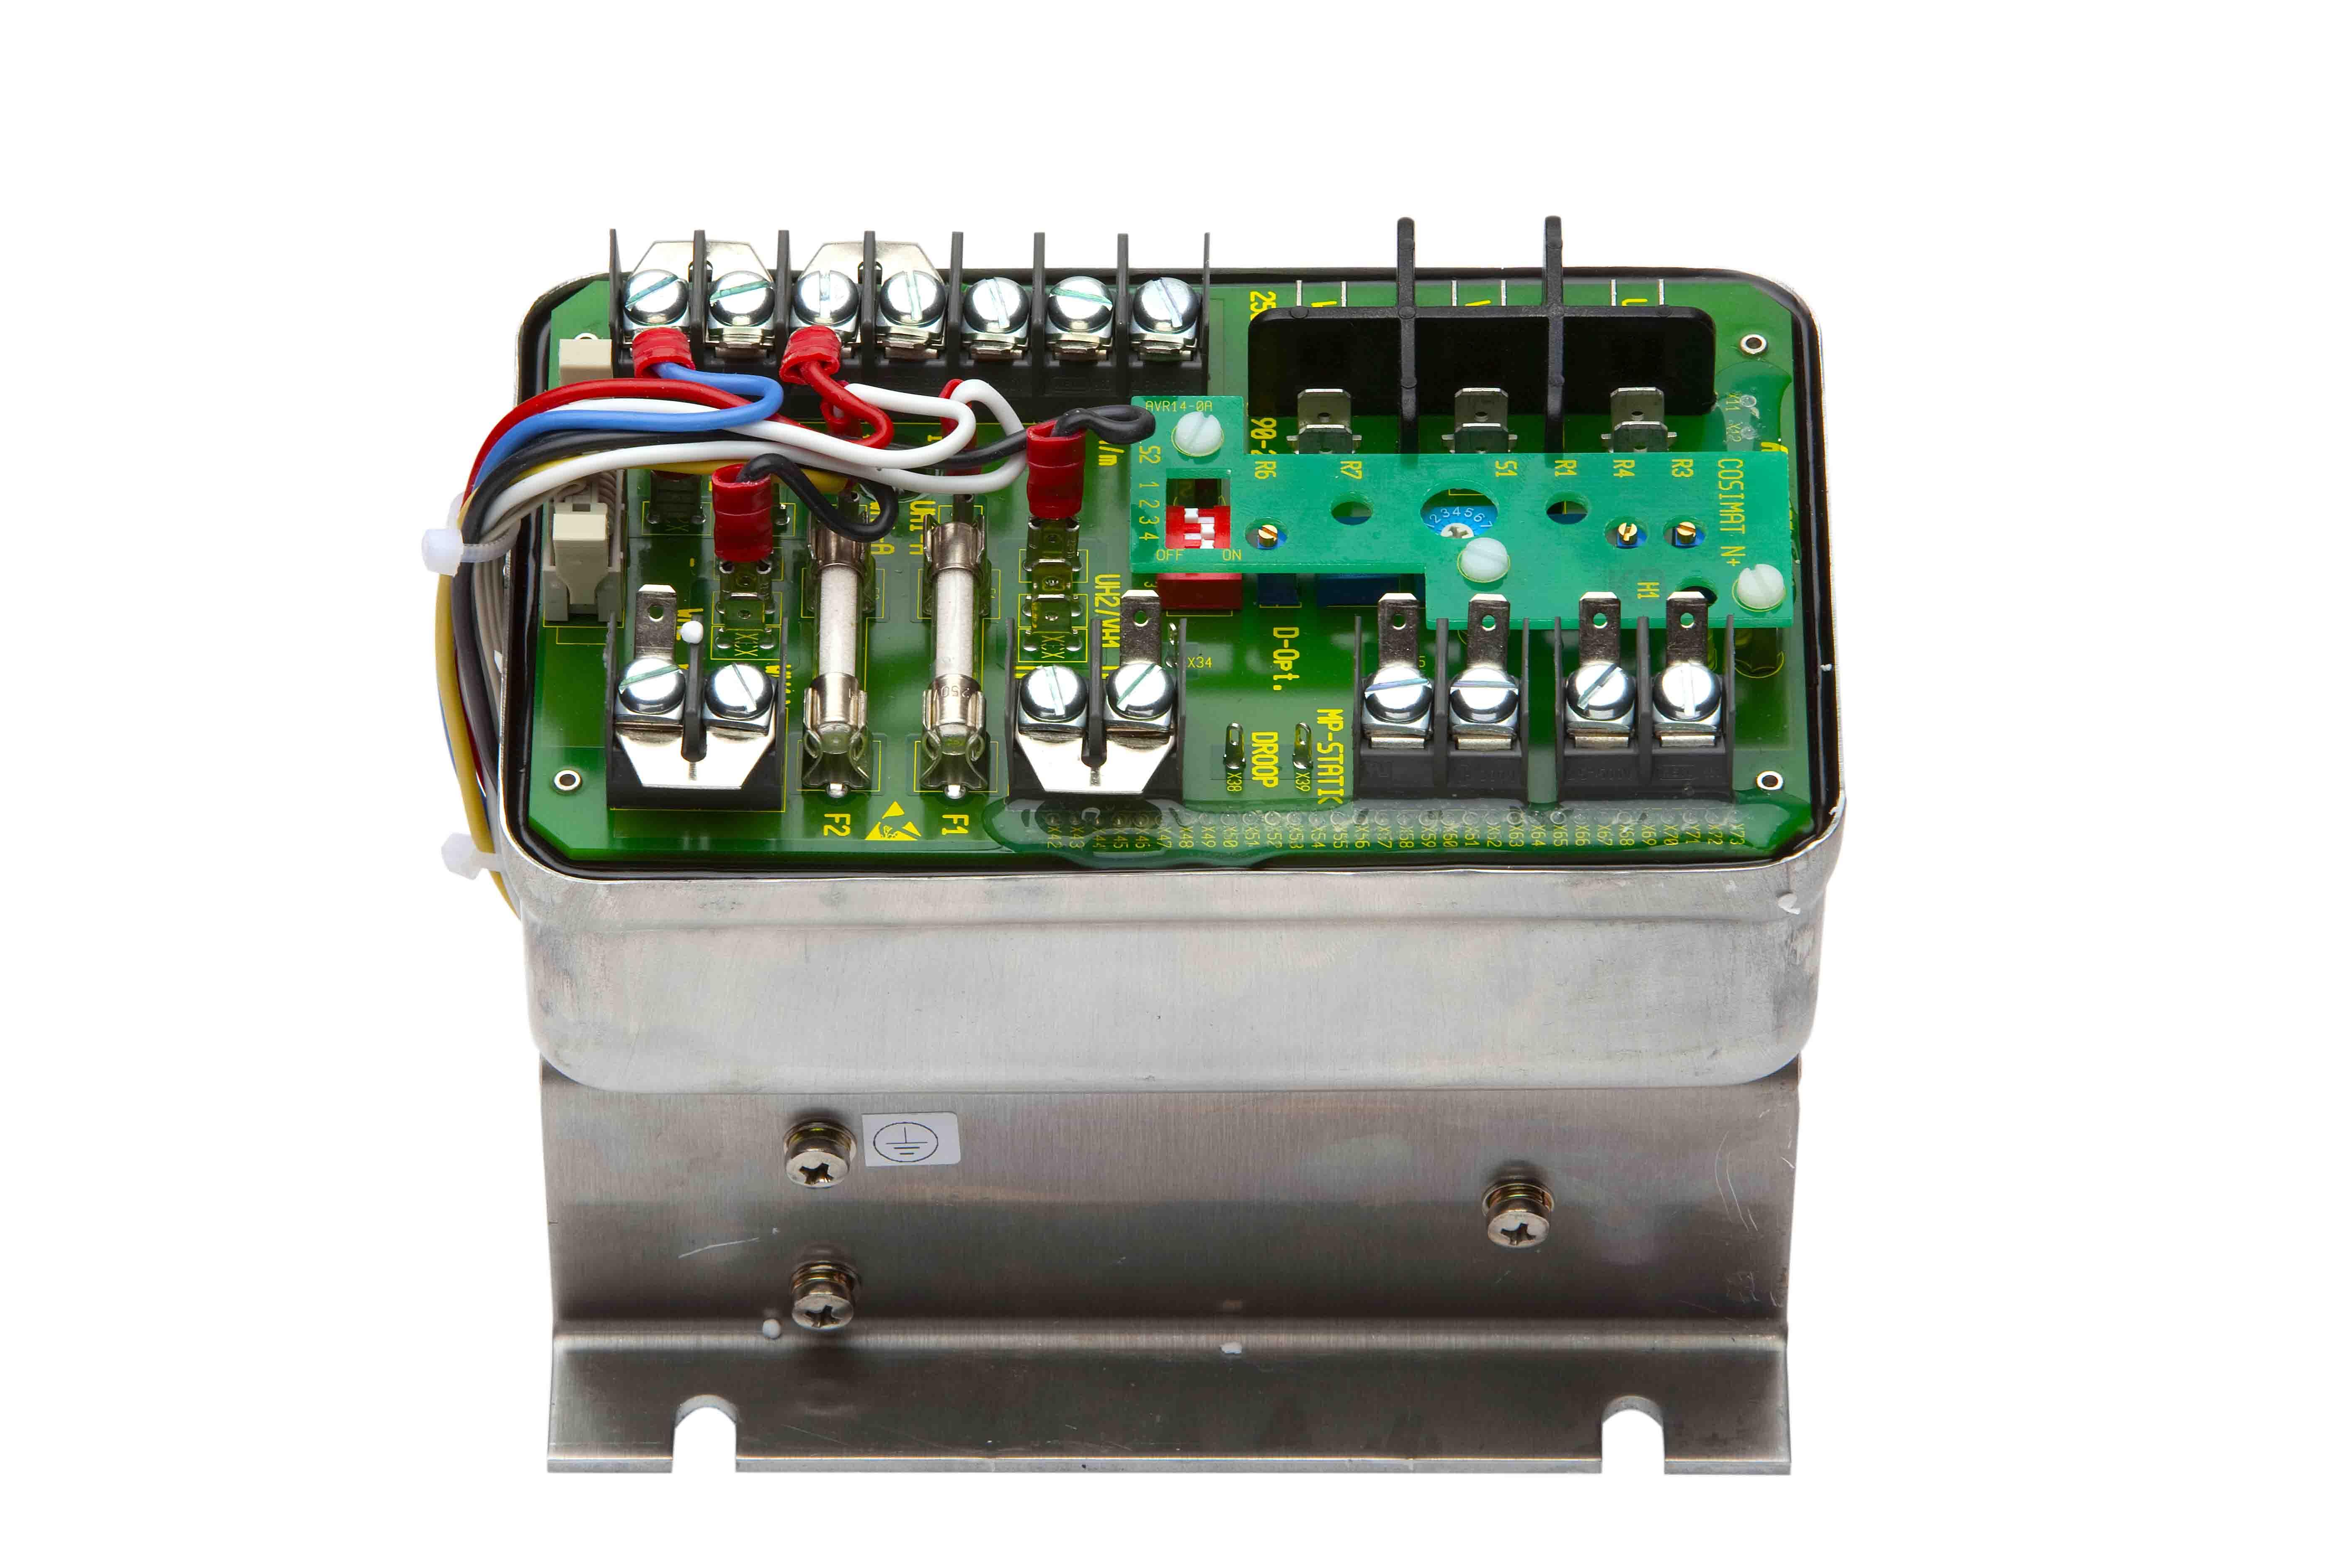 Avk Generator Manual Introduction To Electronic Circuit Design Solutionsrichard R S Array Van Kaick Cosimat N Emri Rh